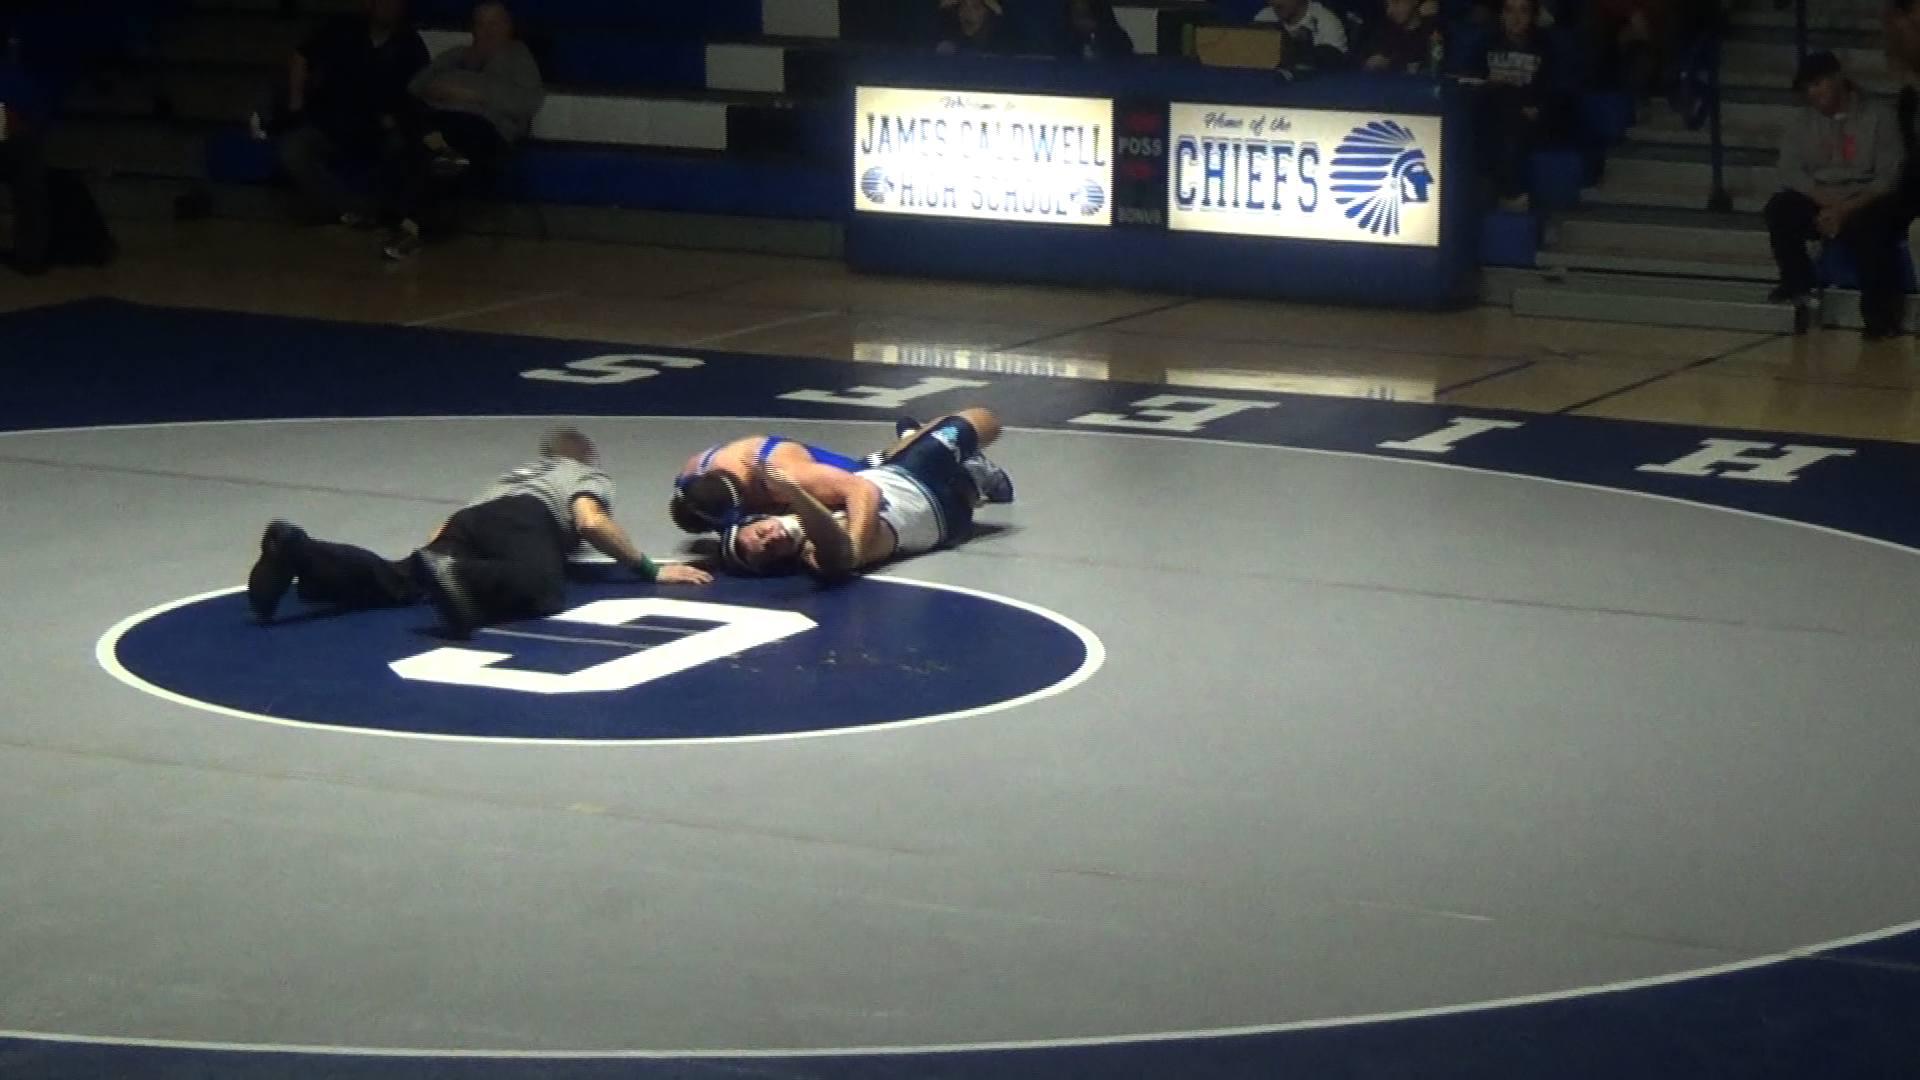 Wrestling - VIDEO: Wayne Valley jolts Paramus to win first wrestling